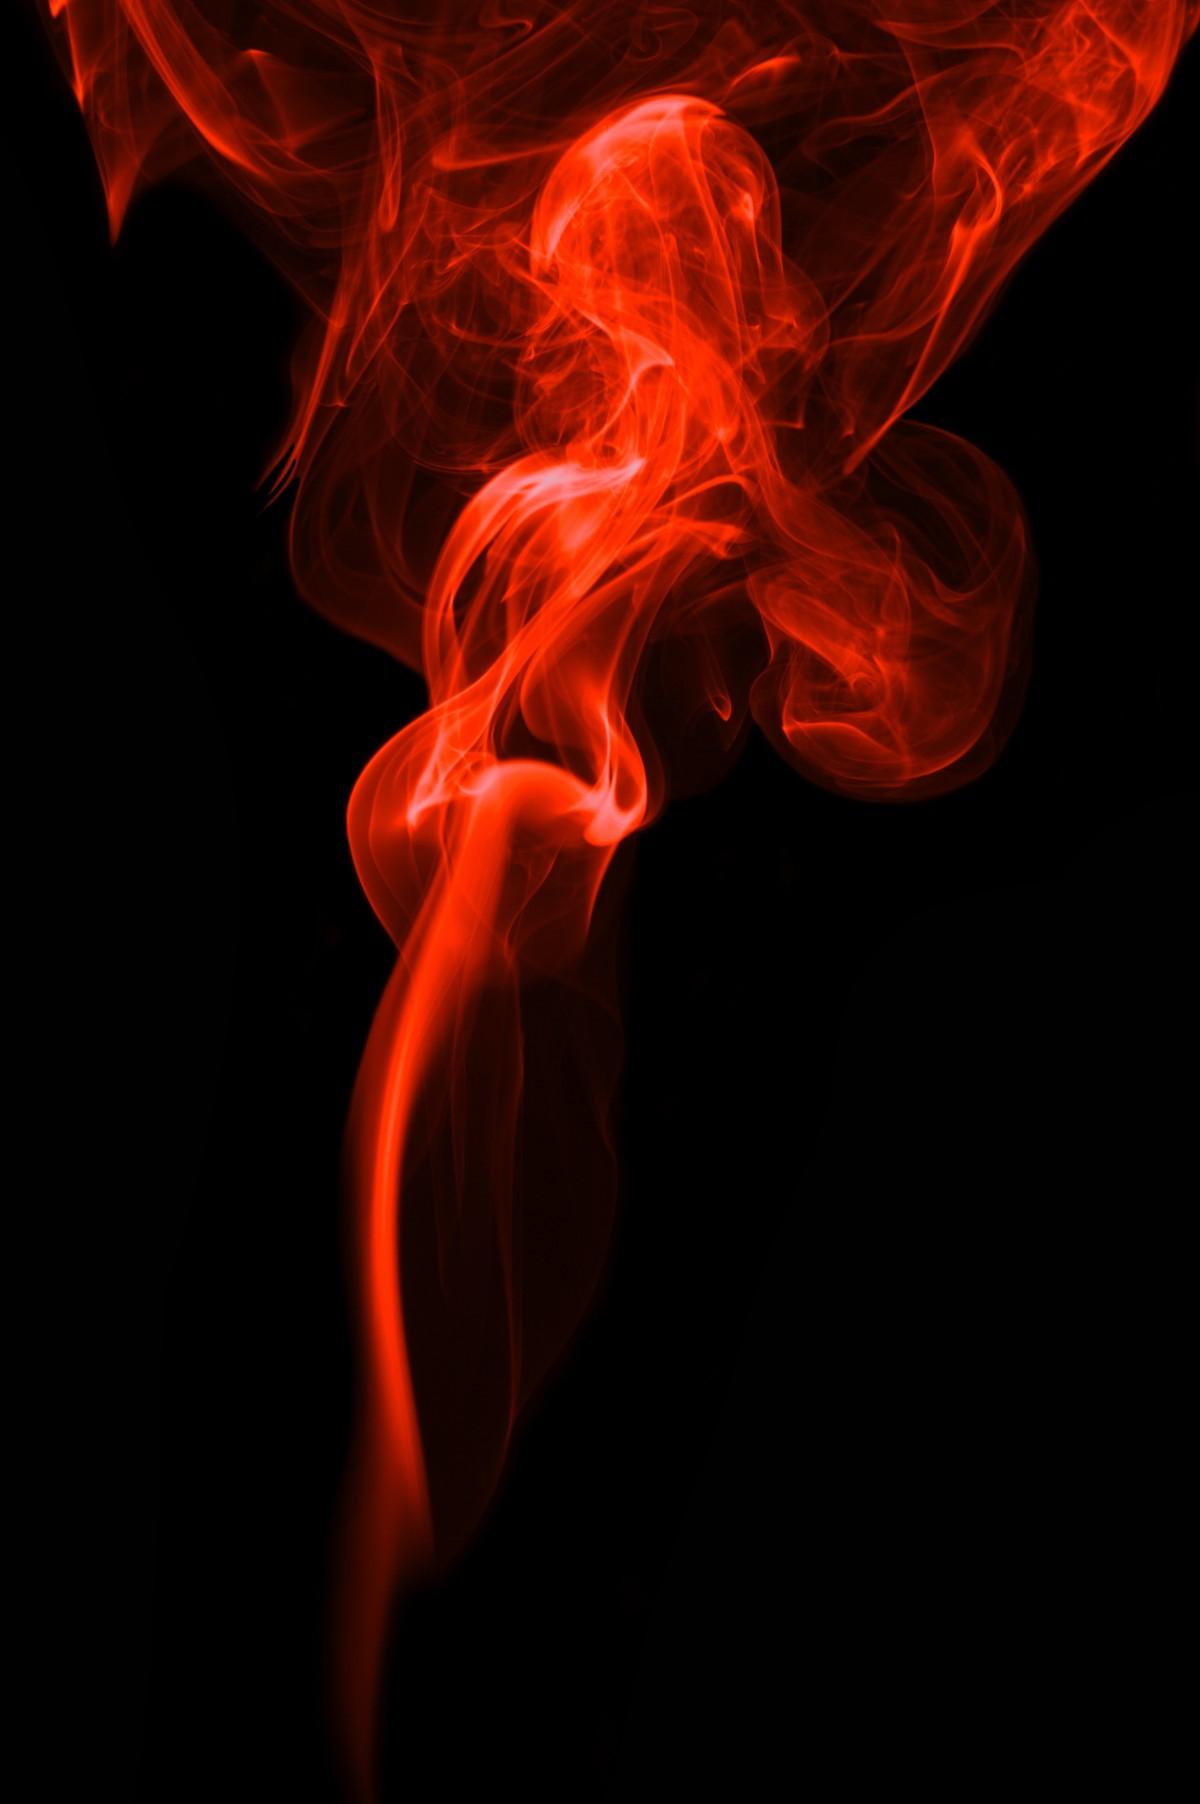 Black Glasses Fire Red